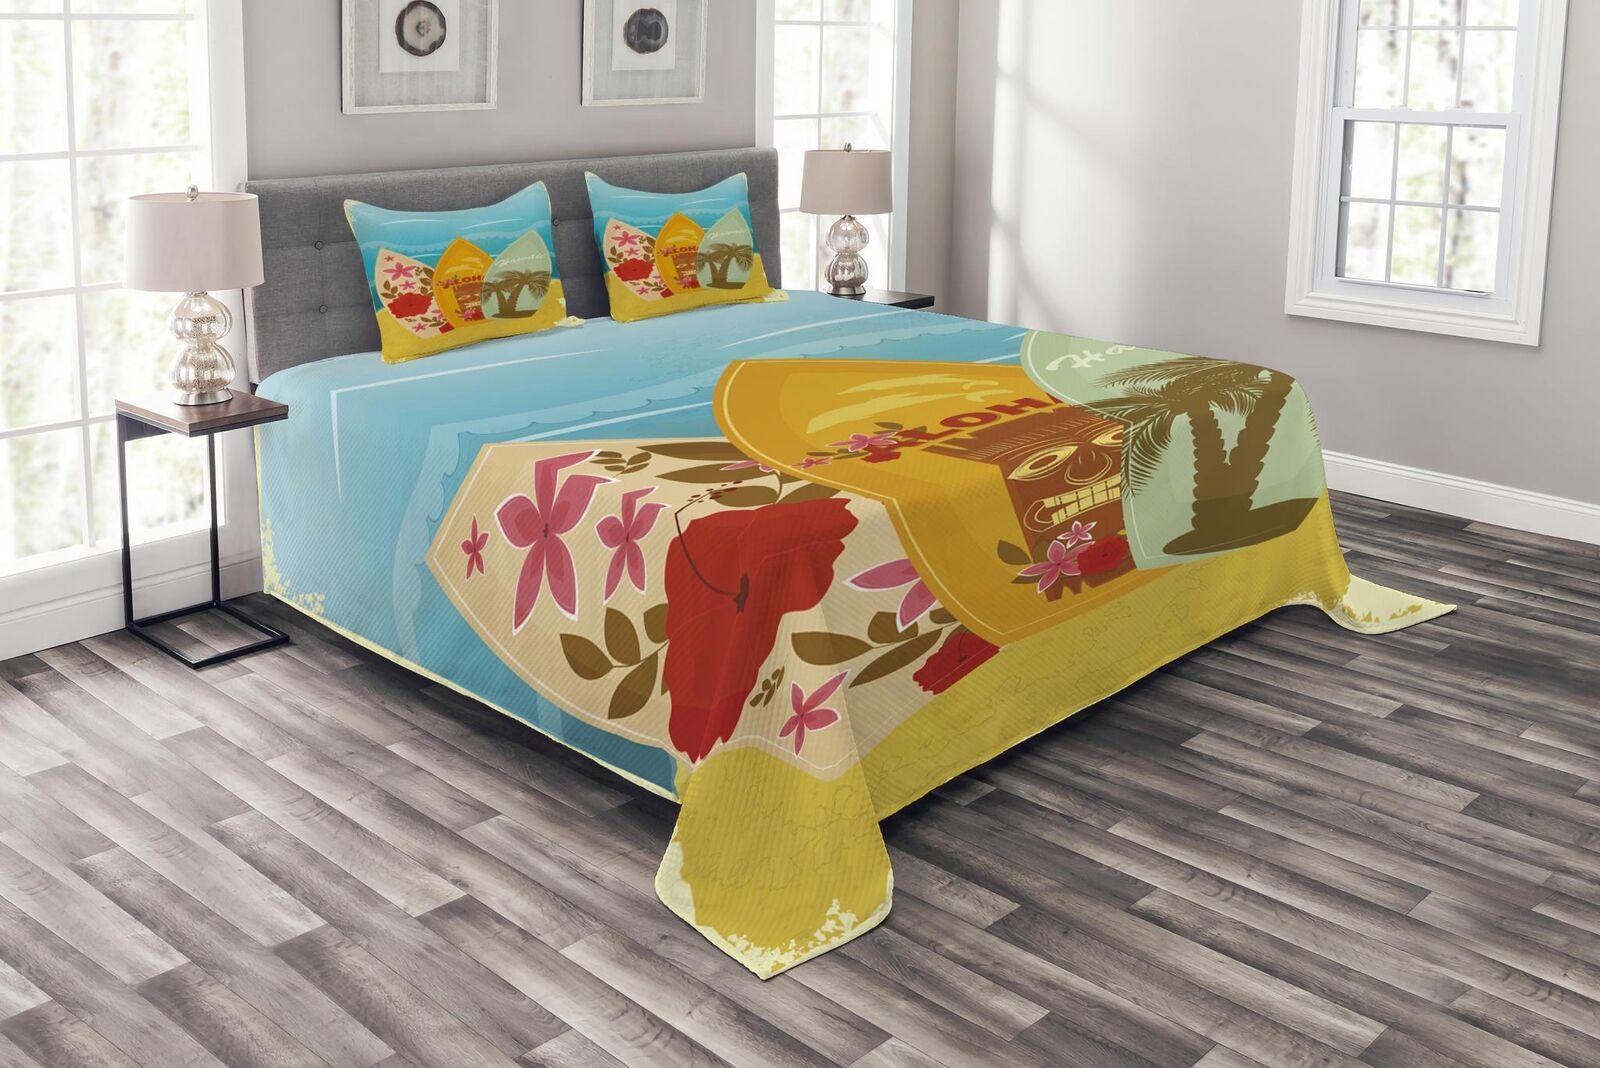 Tiki Tiki Tiki Bar Quilted Bedspread & Pillow Shams Set, Surfboard Exotic Print f9f0fd